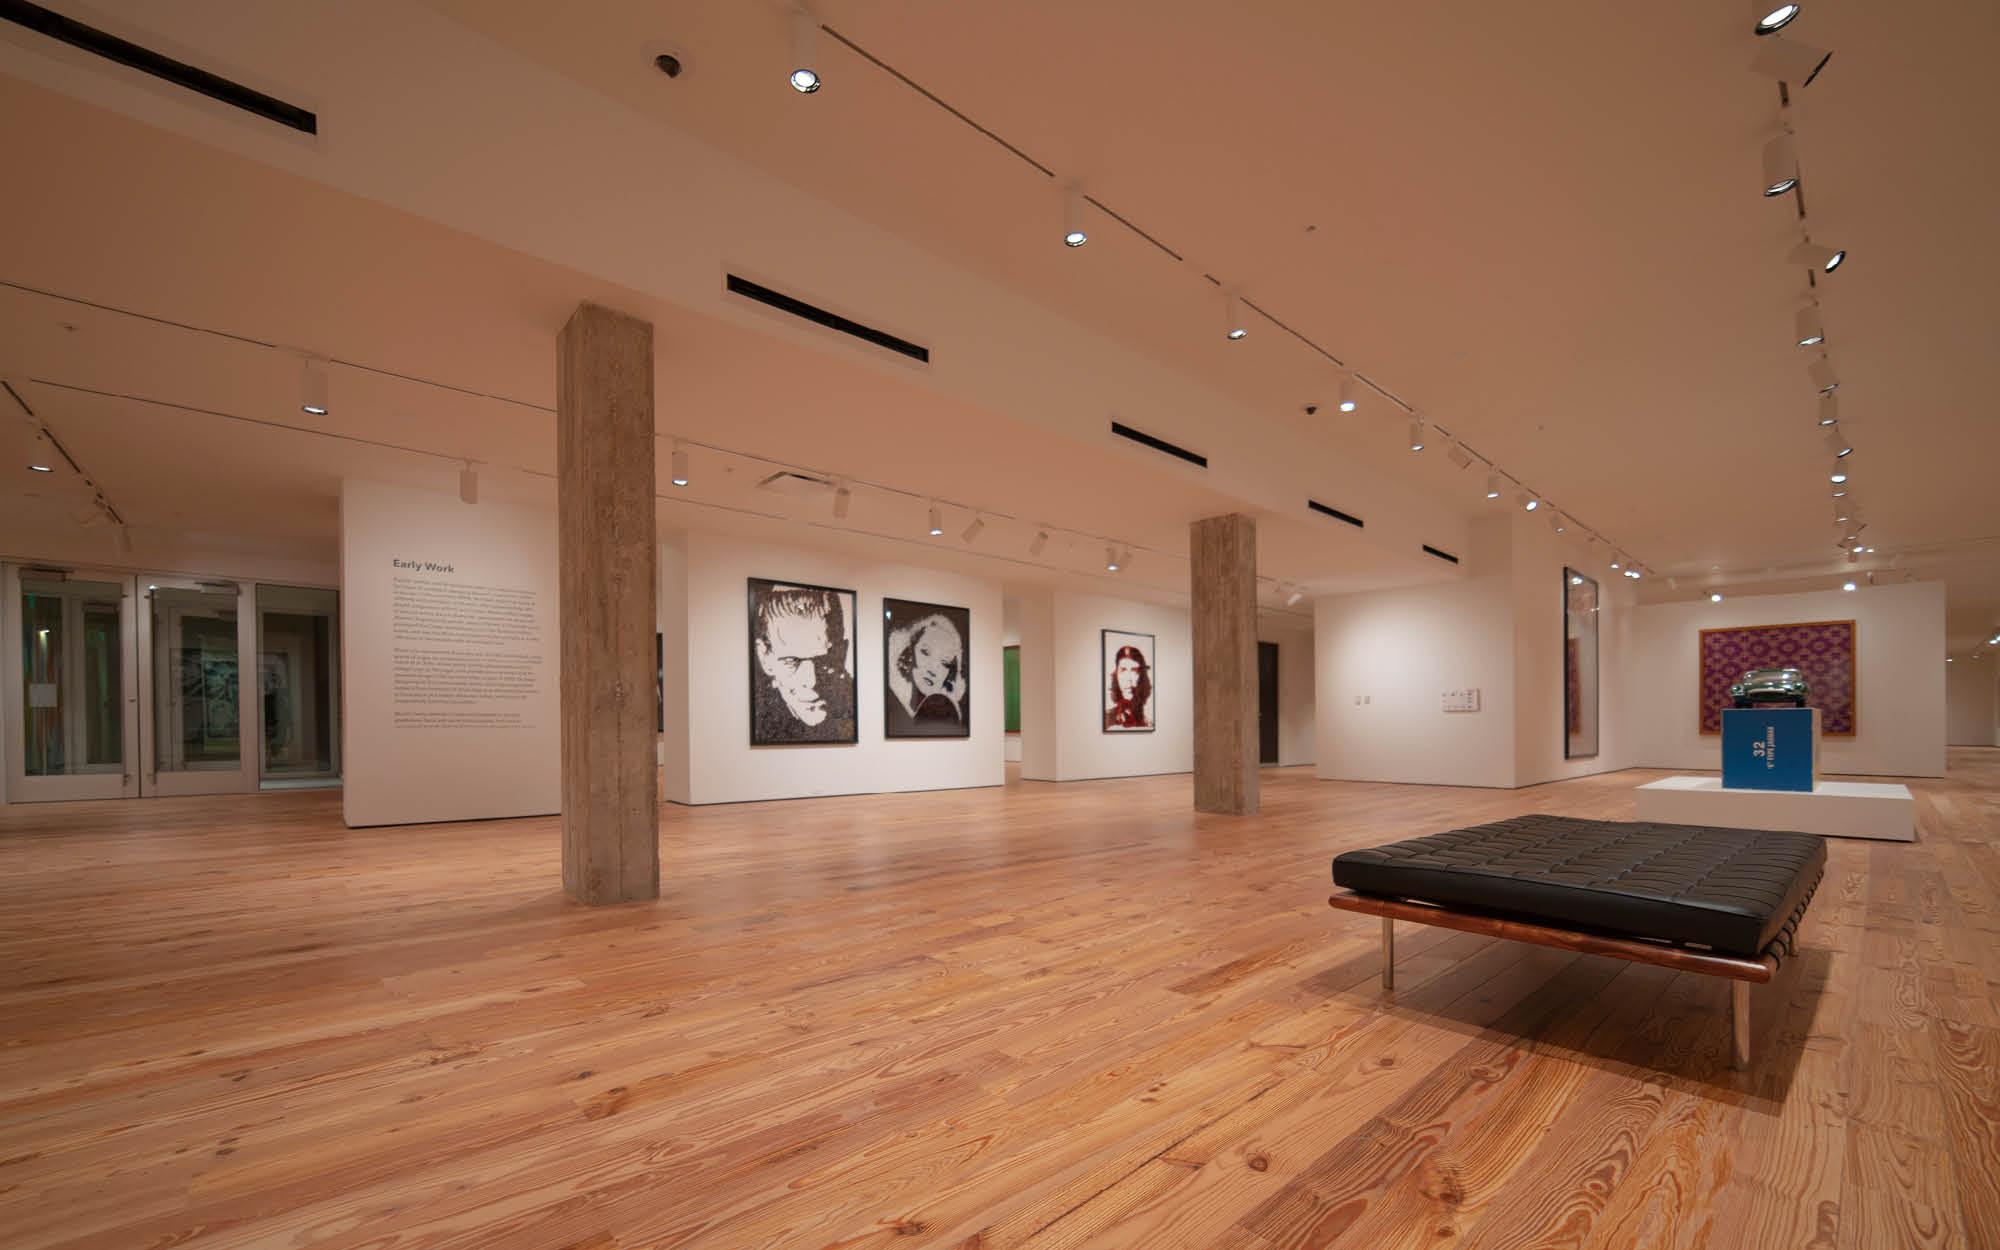 Vik Muniz exhibtion, Elaine And William W. Crouse Gallery